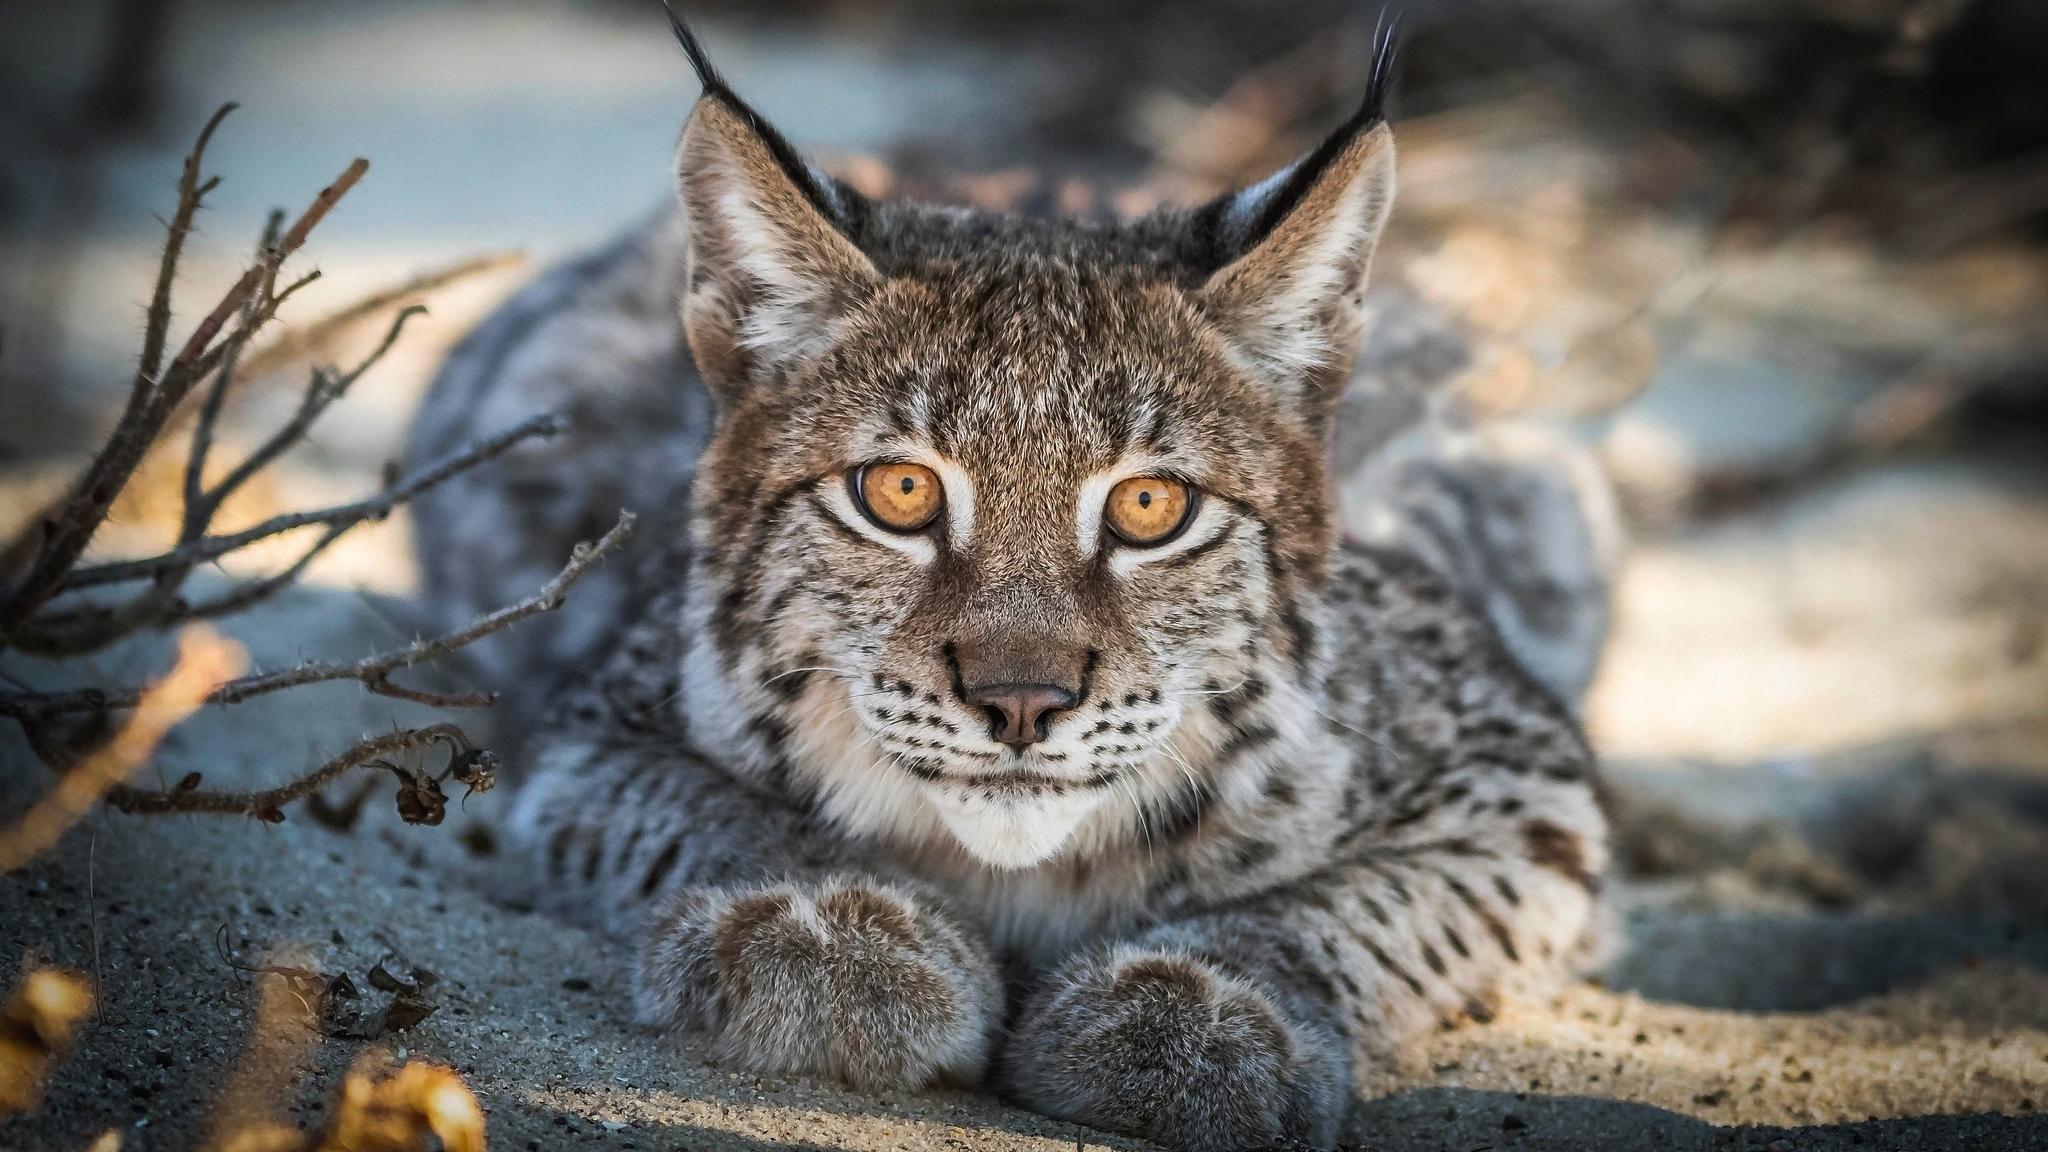 Close up, Lynx, cat, predator, muzzle, 2048x1152 wallpaper